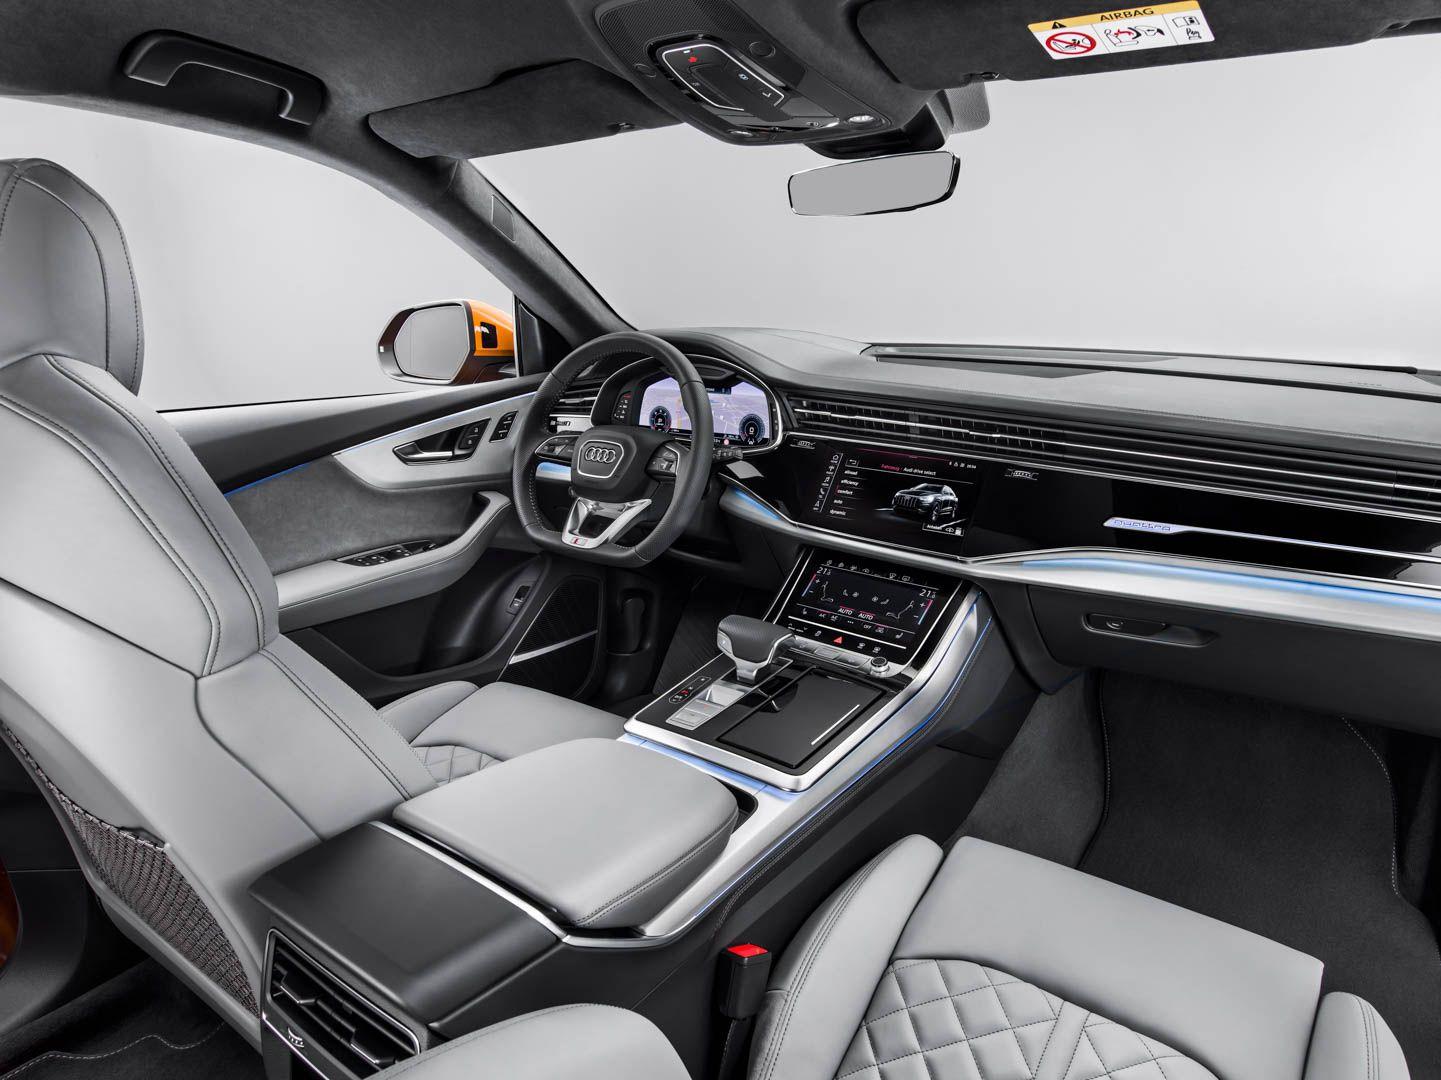 Video Audi Q8 Reviewed By Carwow Audi Q3 Audi Q7 Interior New Engine